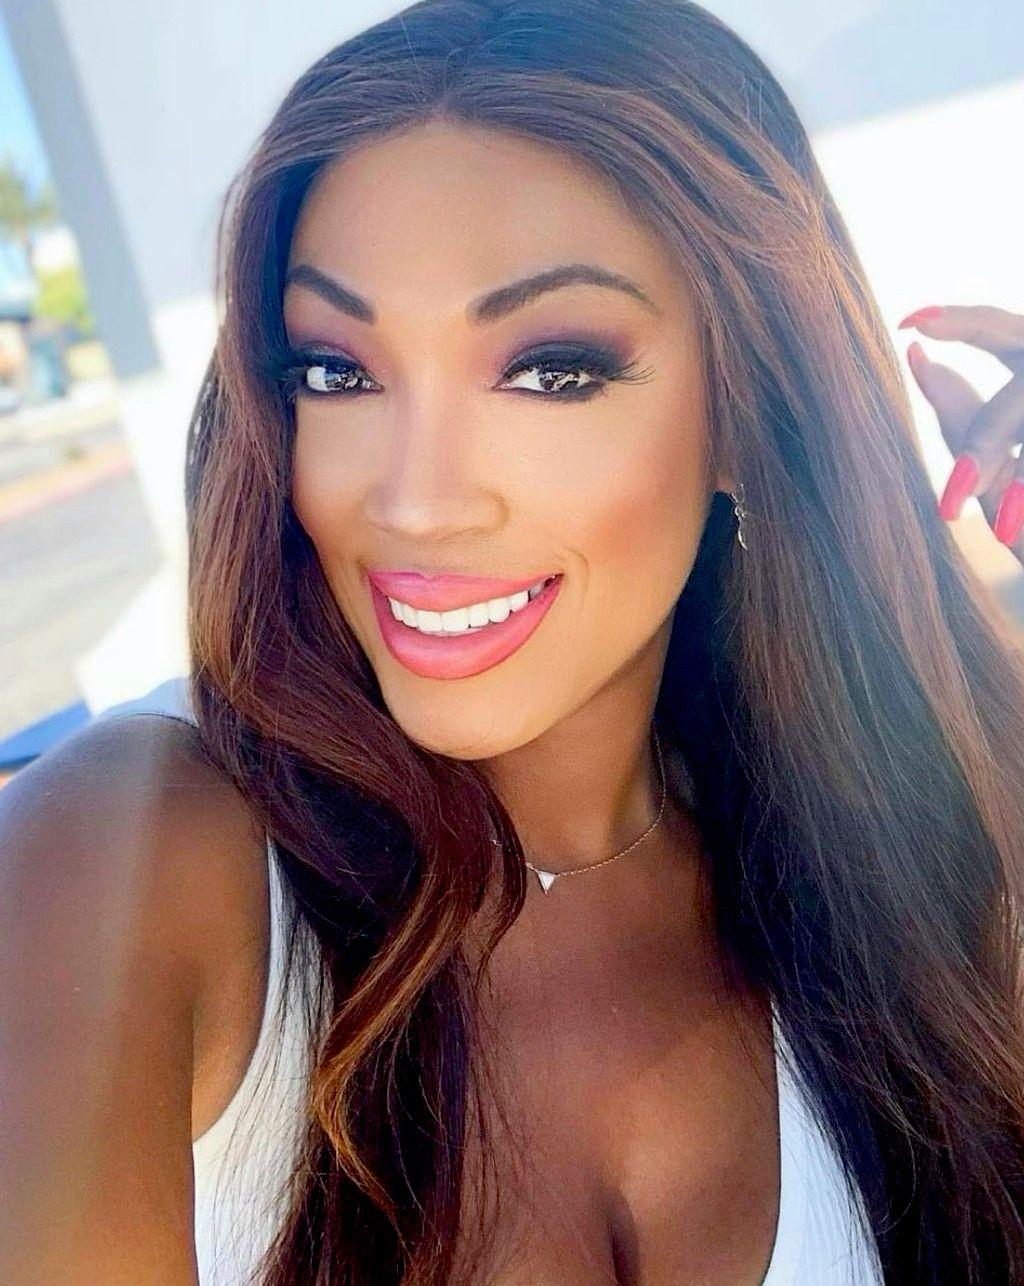 Shandra Stylez -Makeup Artist and more